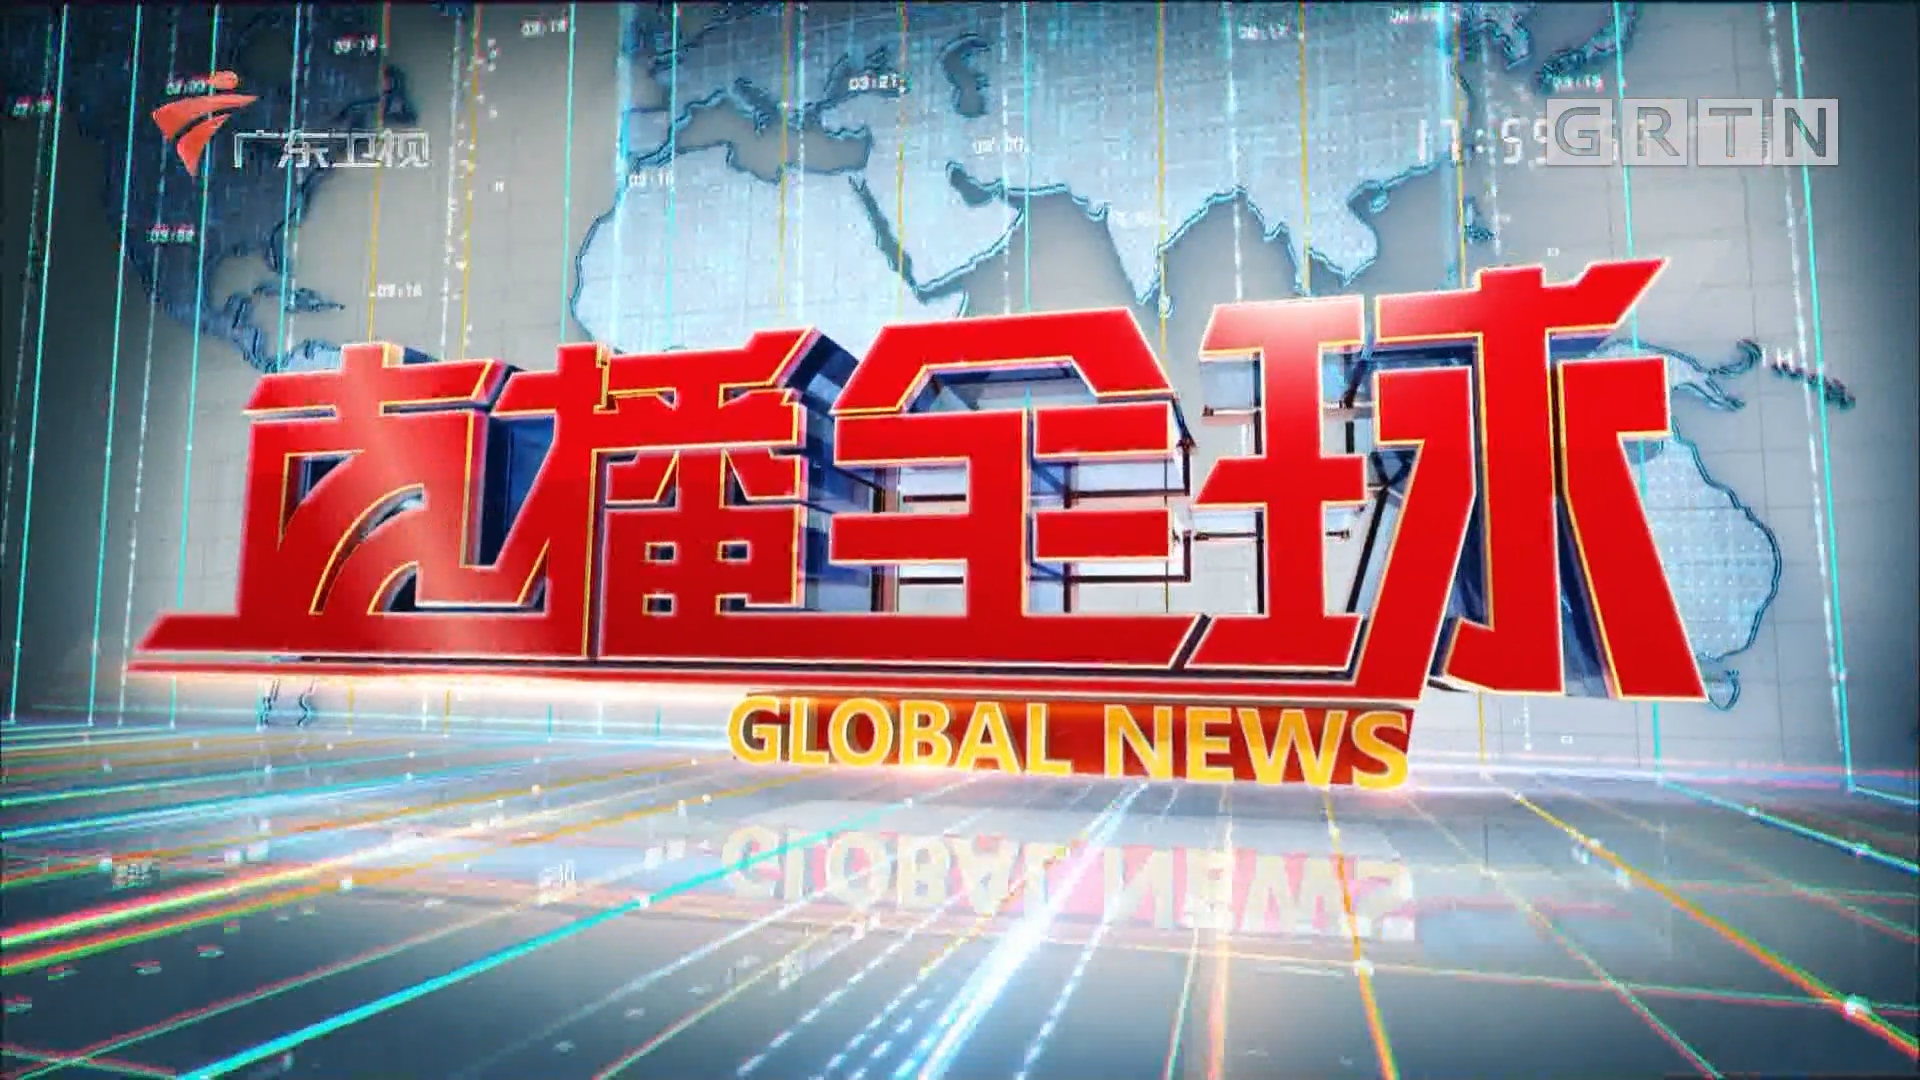 [HD][2018-11-02]直播全球:俄官员称或在古巴建军事基地:古巴导弹危机2.0?